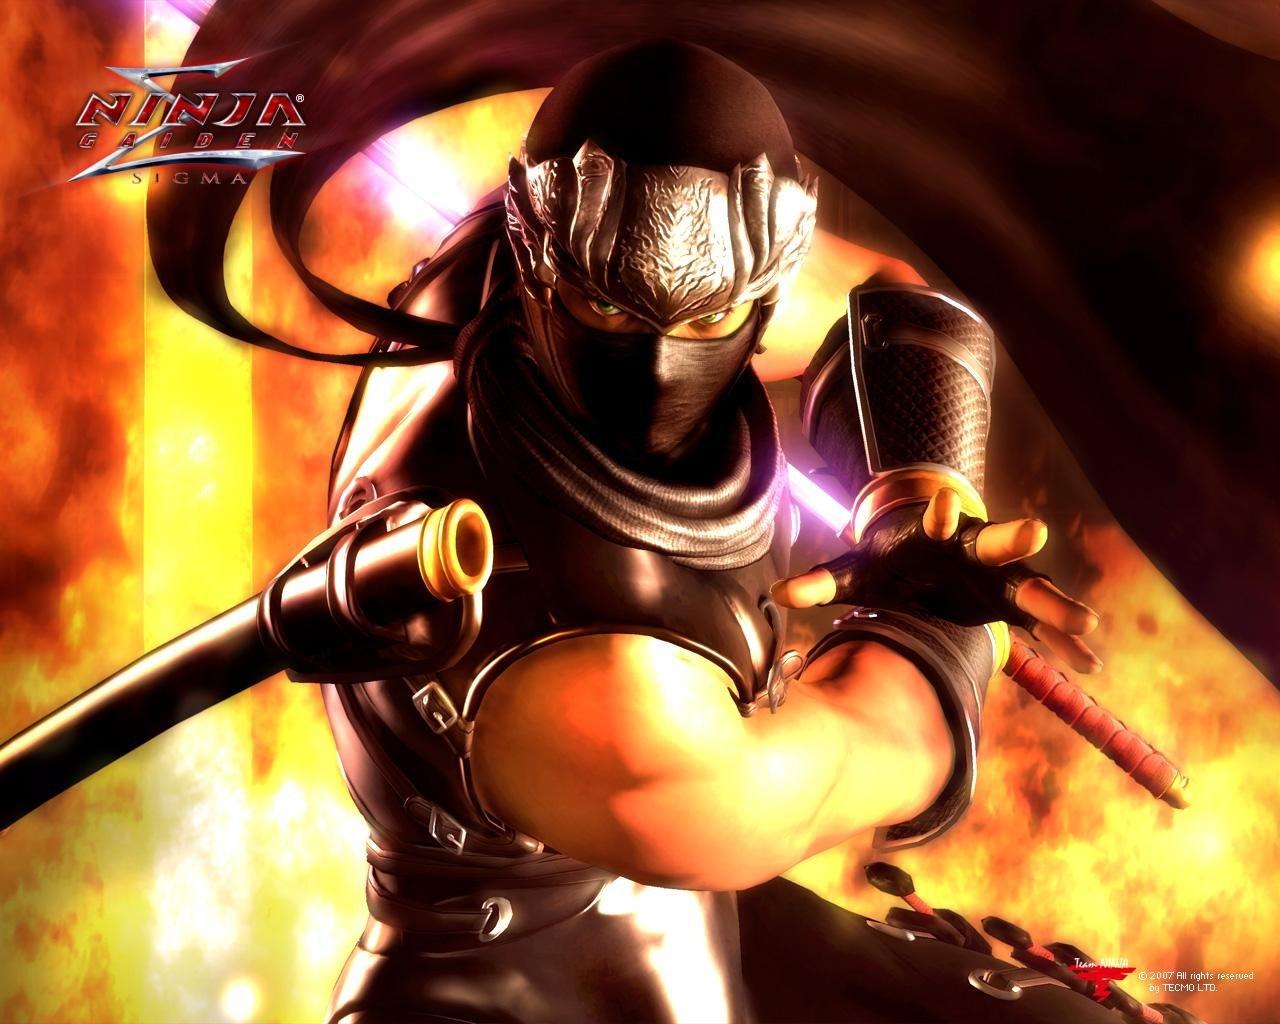 Best Ninja Gaiden Wallpaper ID47367 For High Resolution Hd 1280x1024 Desktop